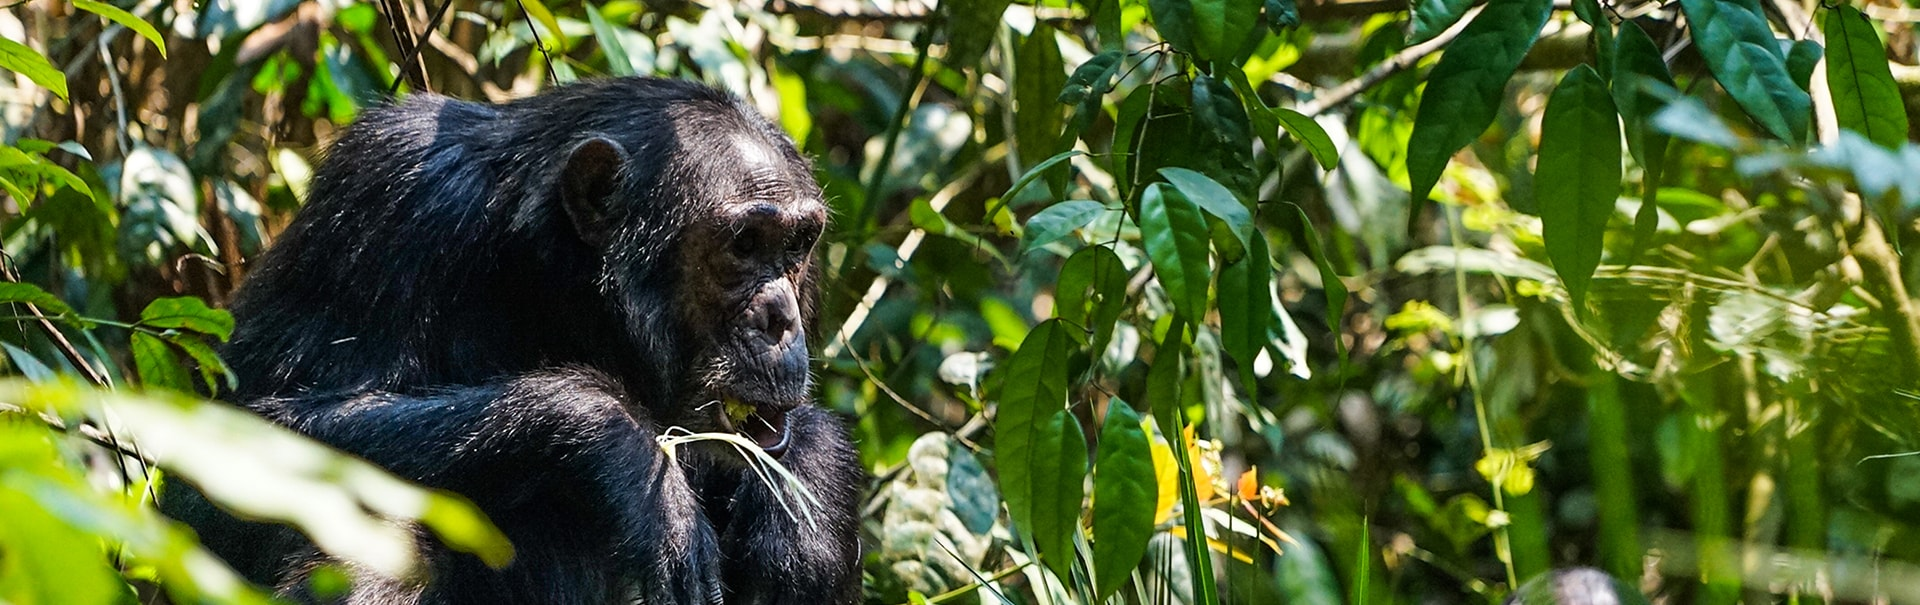 Gorilla and Chimpanzee Trek in Uganda (SHUG1) Banner